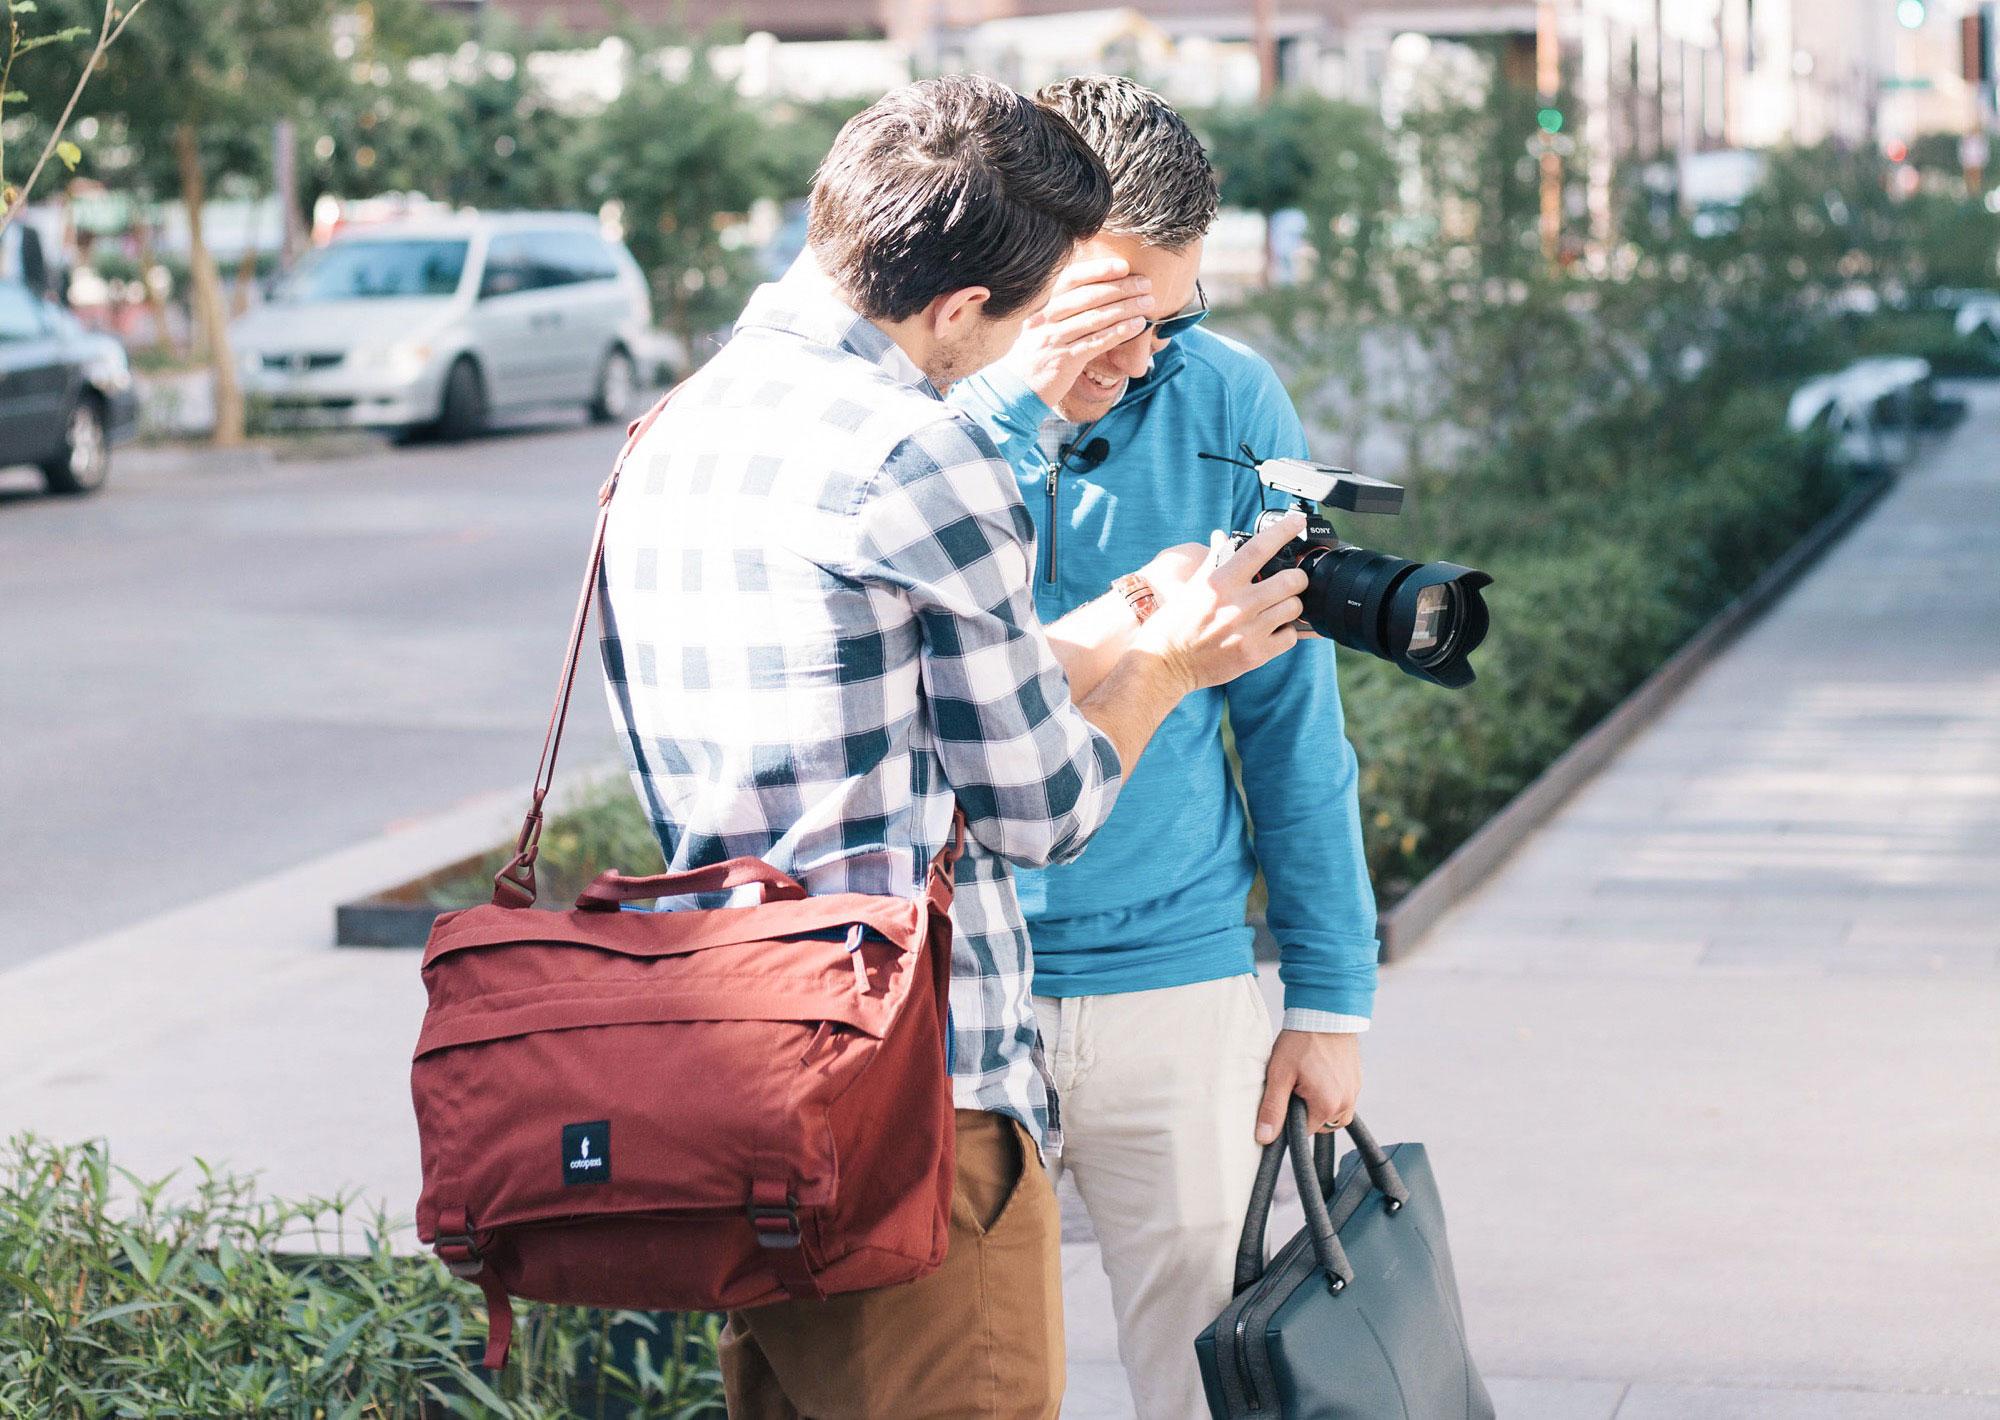 90861a29bc A Laptop Bag For The Urban Adventurer - Cotopaxi Kpong 15L Satchel